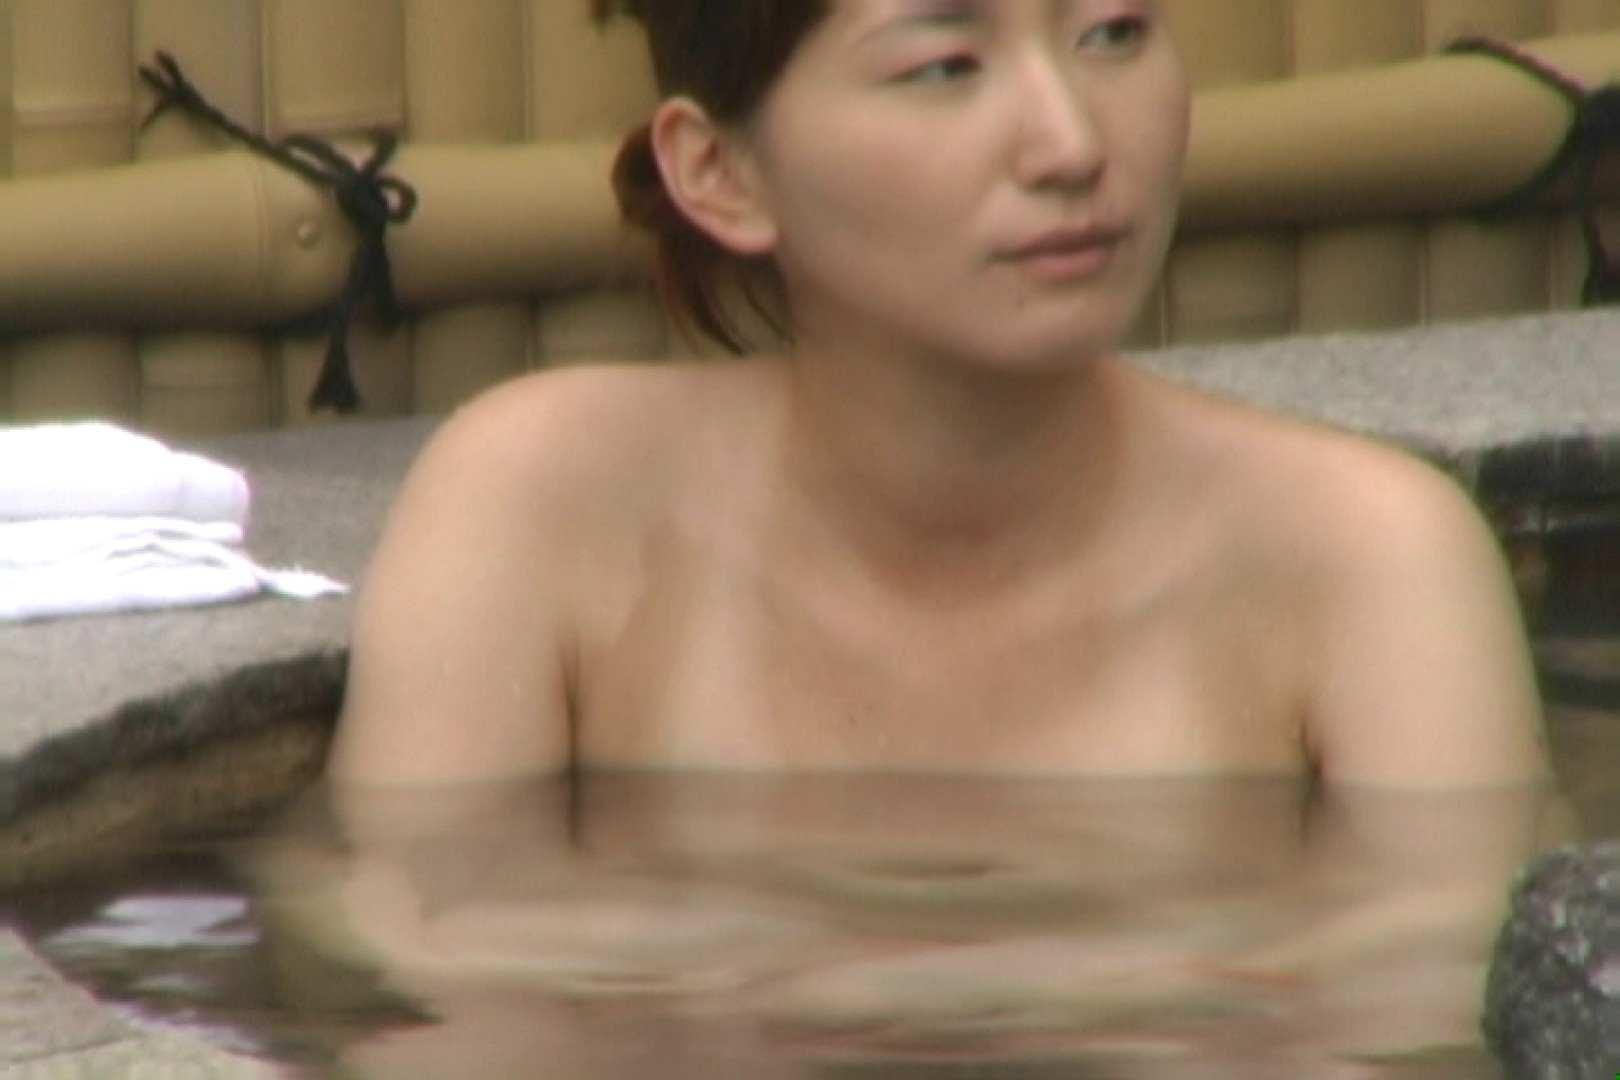 Aquaな露天風呂Vol.616 露天風呂編  89PIX 62